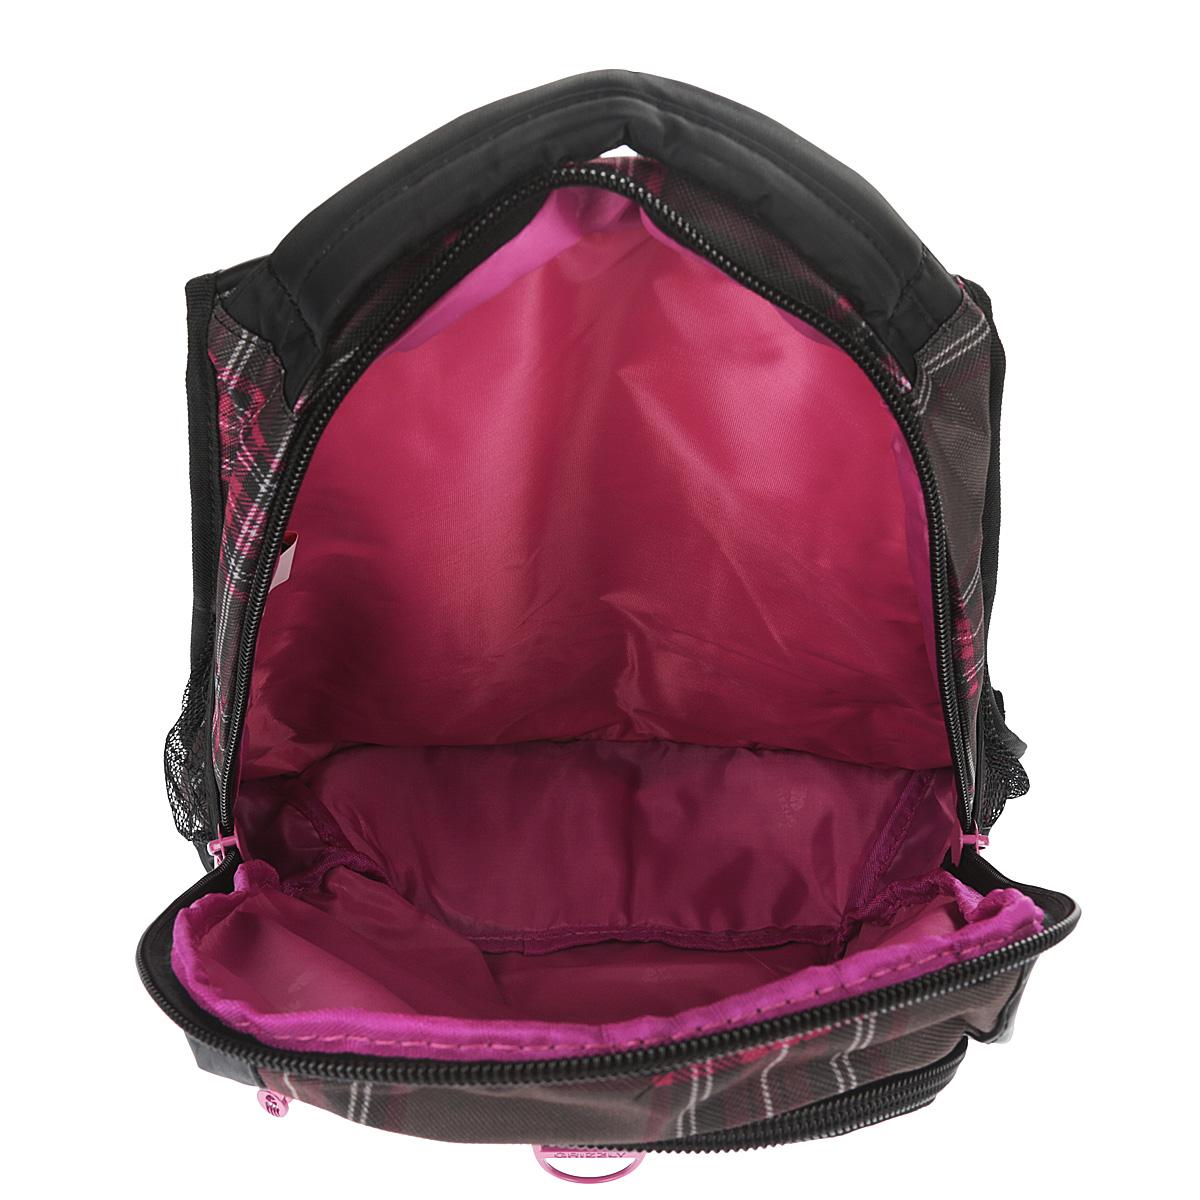 Рюкзак городской Grizzly, цвет: клетка фуксия, 24 л. RD-521-1/6 ( RD-521-1/6 )